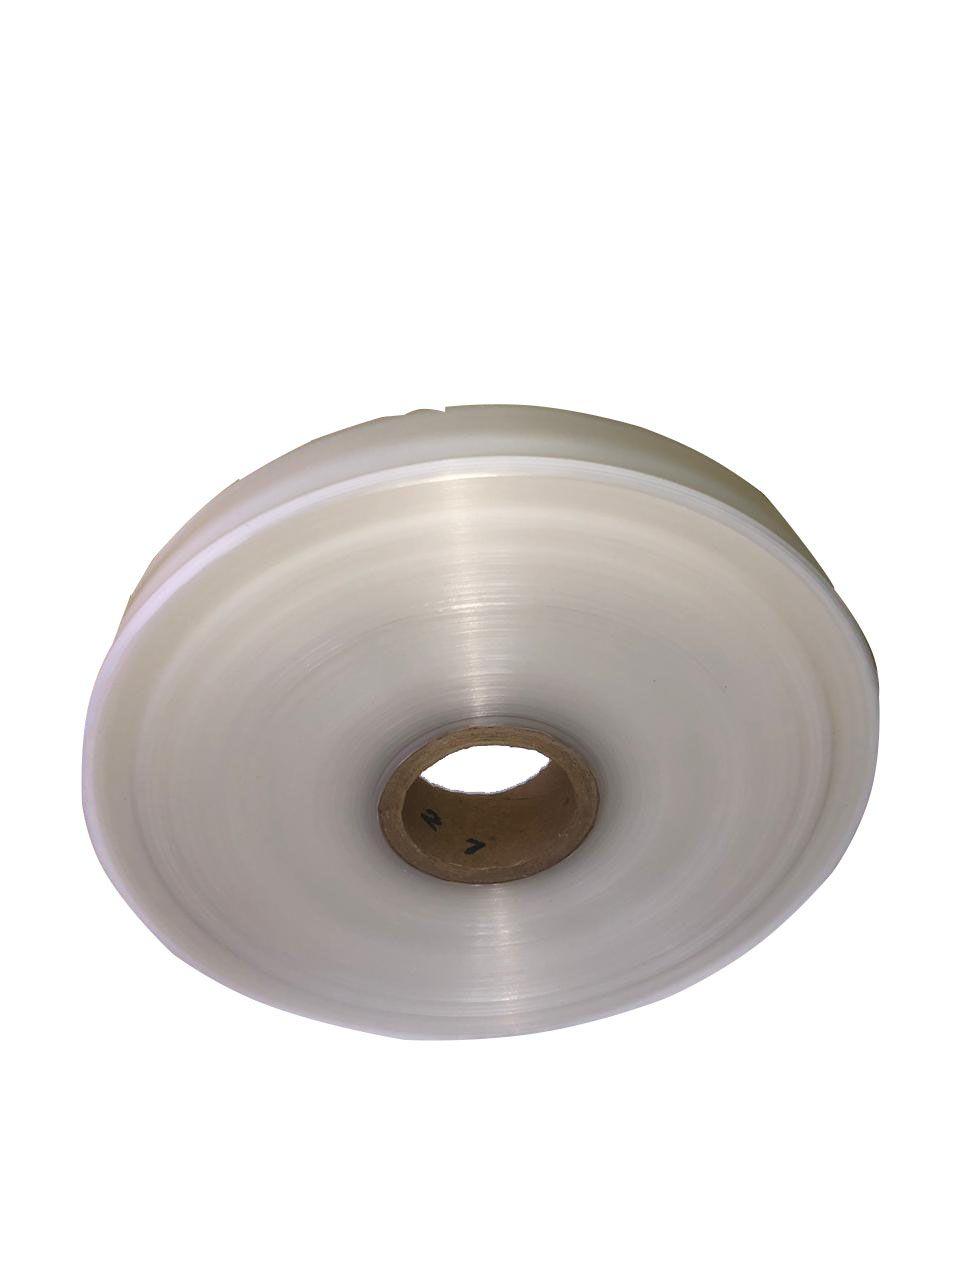 Bobina Plastica Tubular 4x0,10 Geladinho 3kg